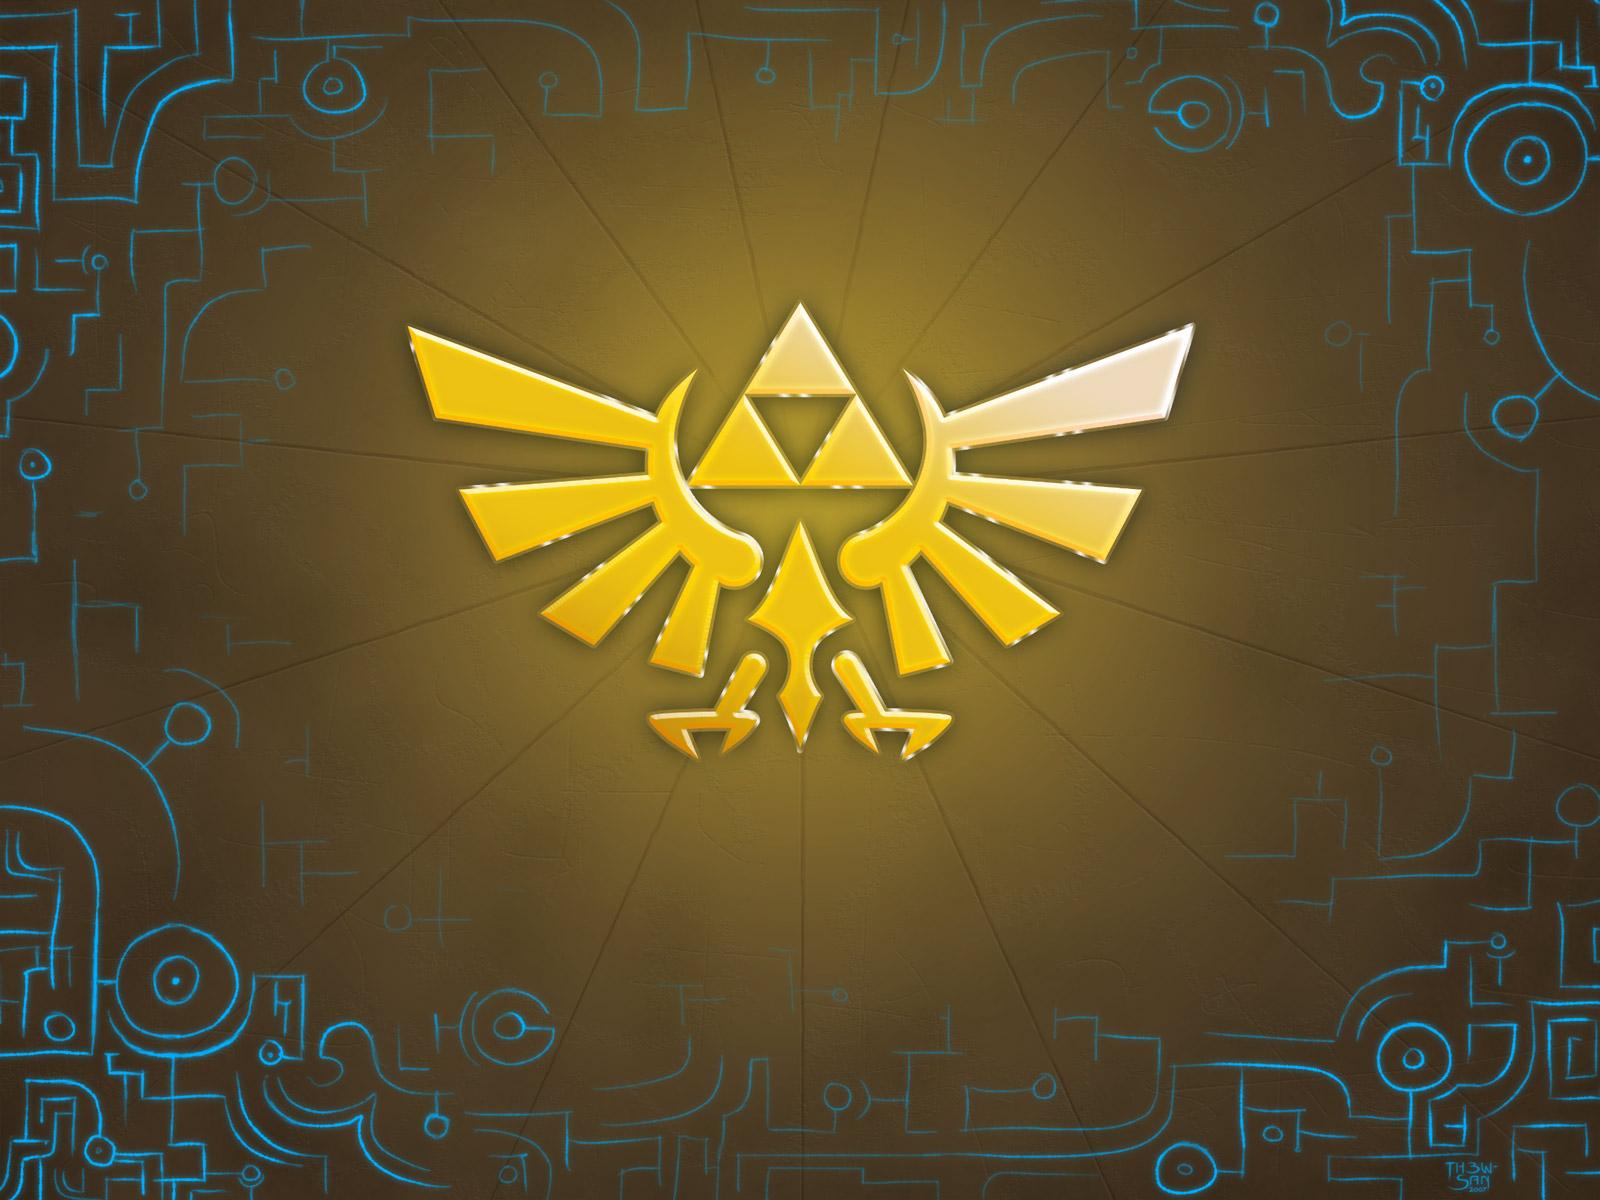 Zelda wallpaper fond ecran triforce jeux video info for Ecran wallpaper